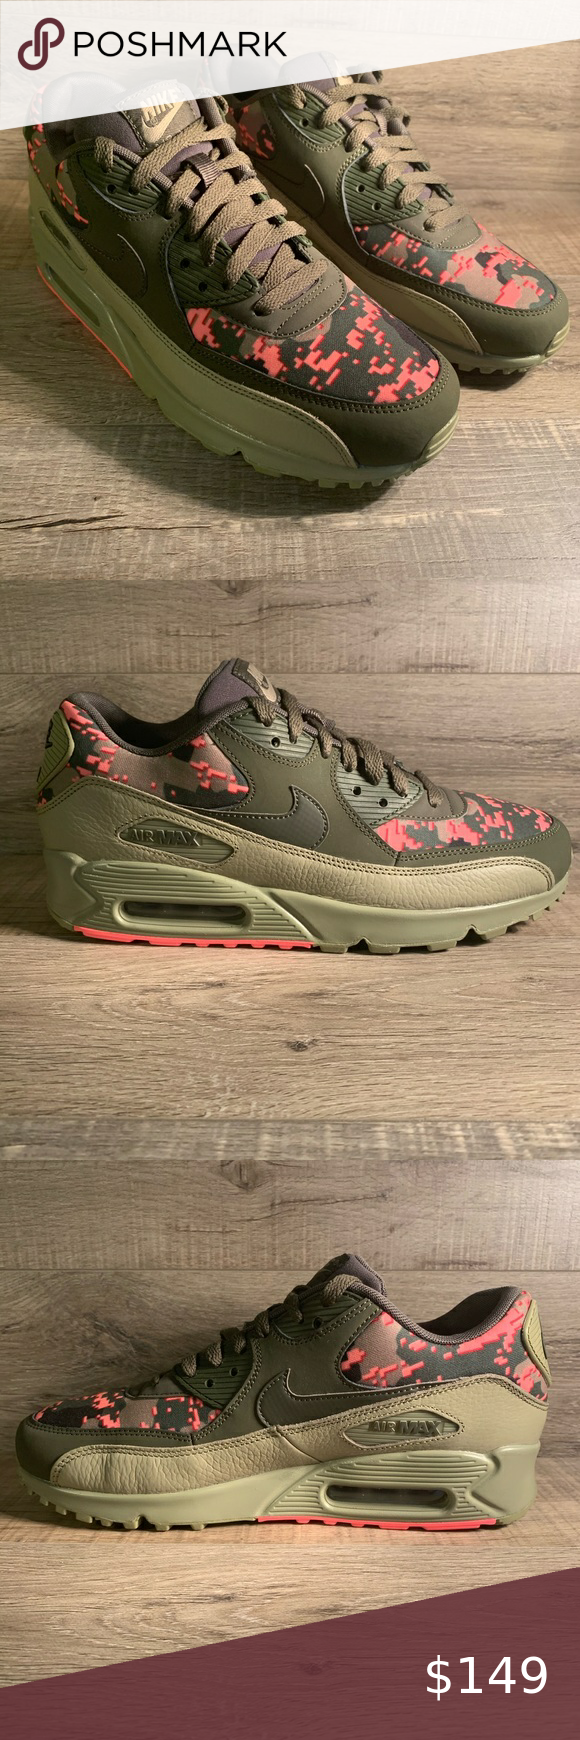 Nike Air Max 90 C Digi Camo Olive in